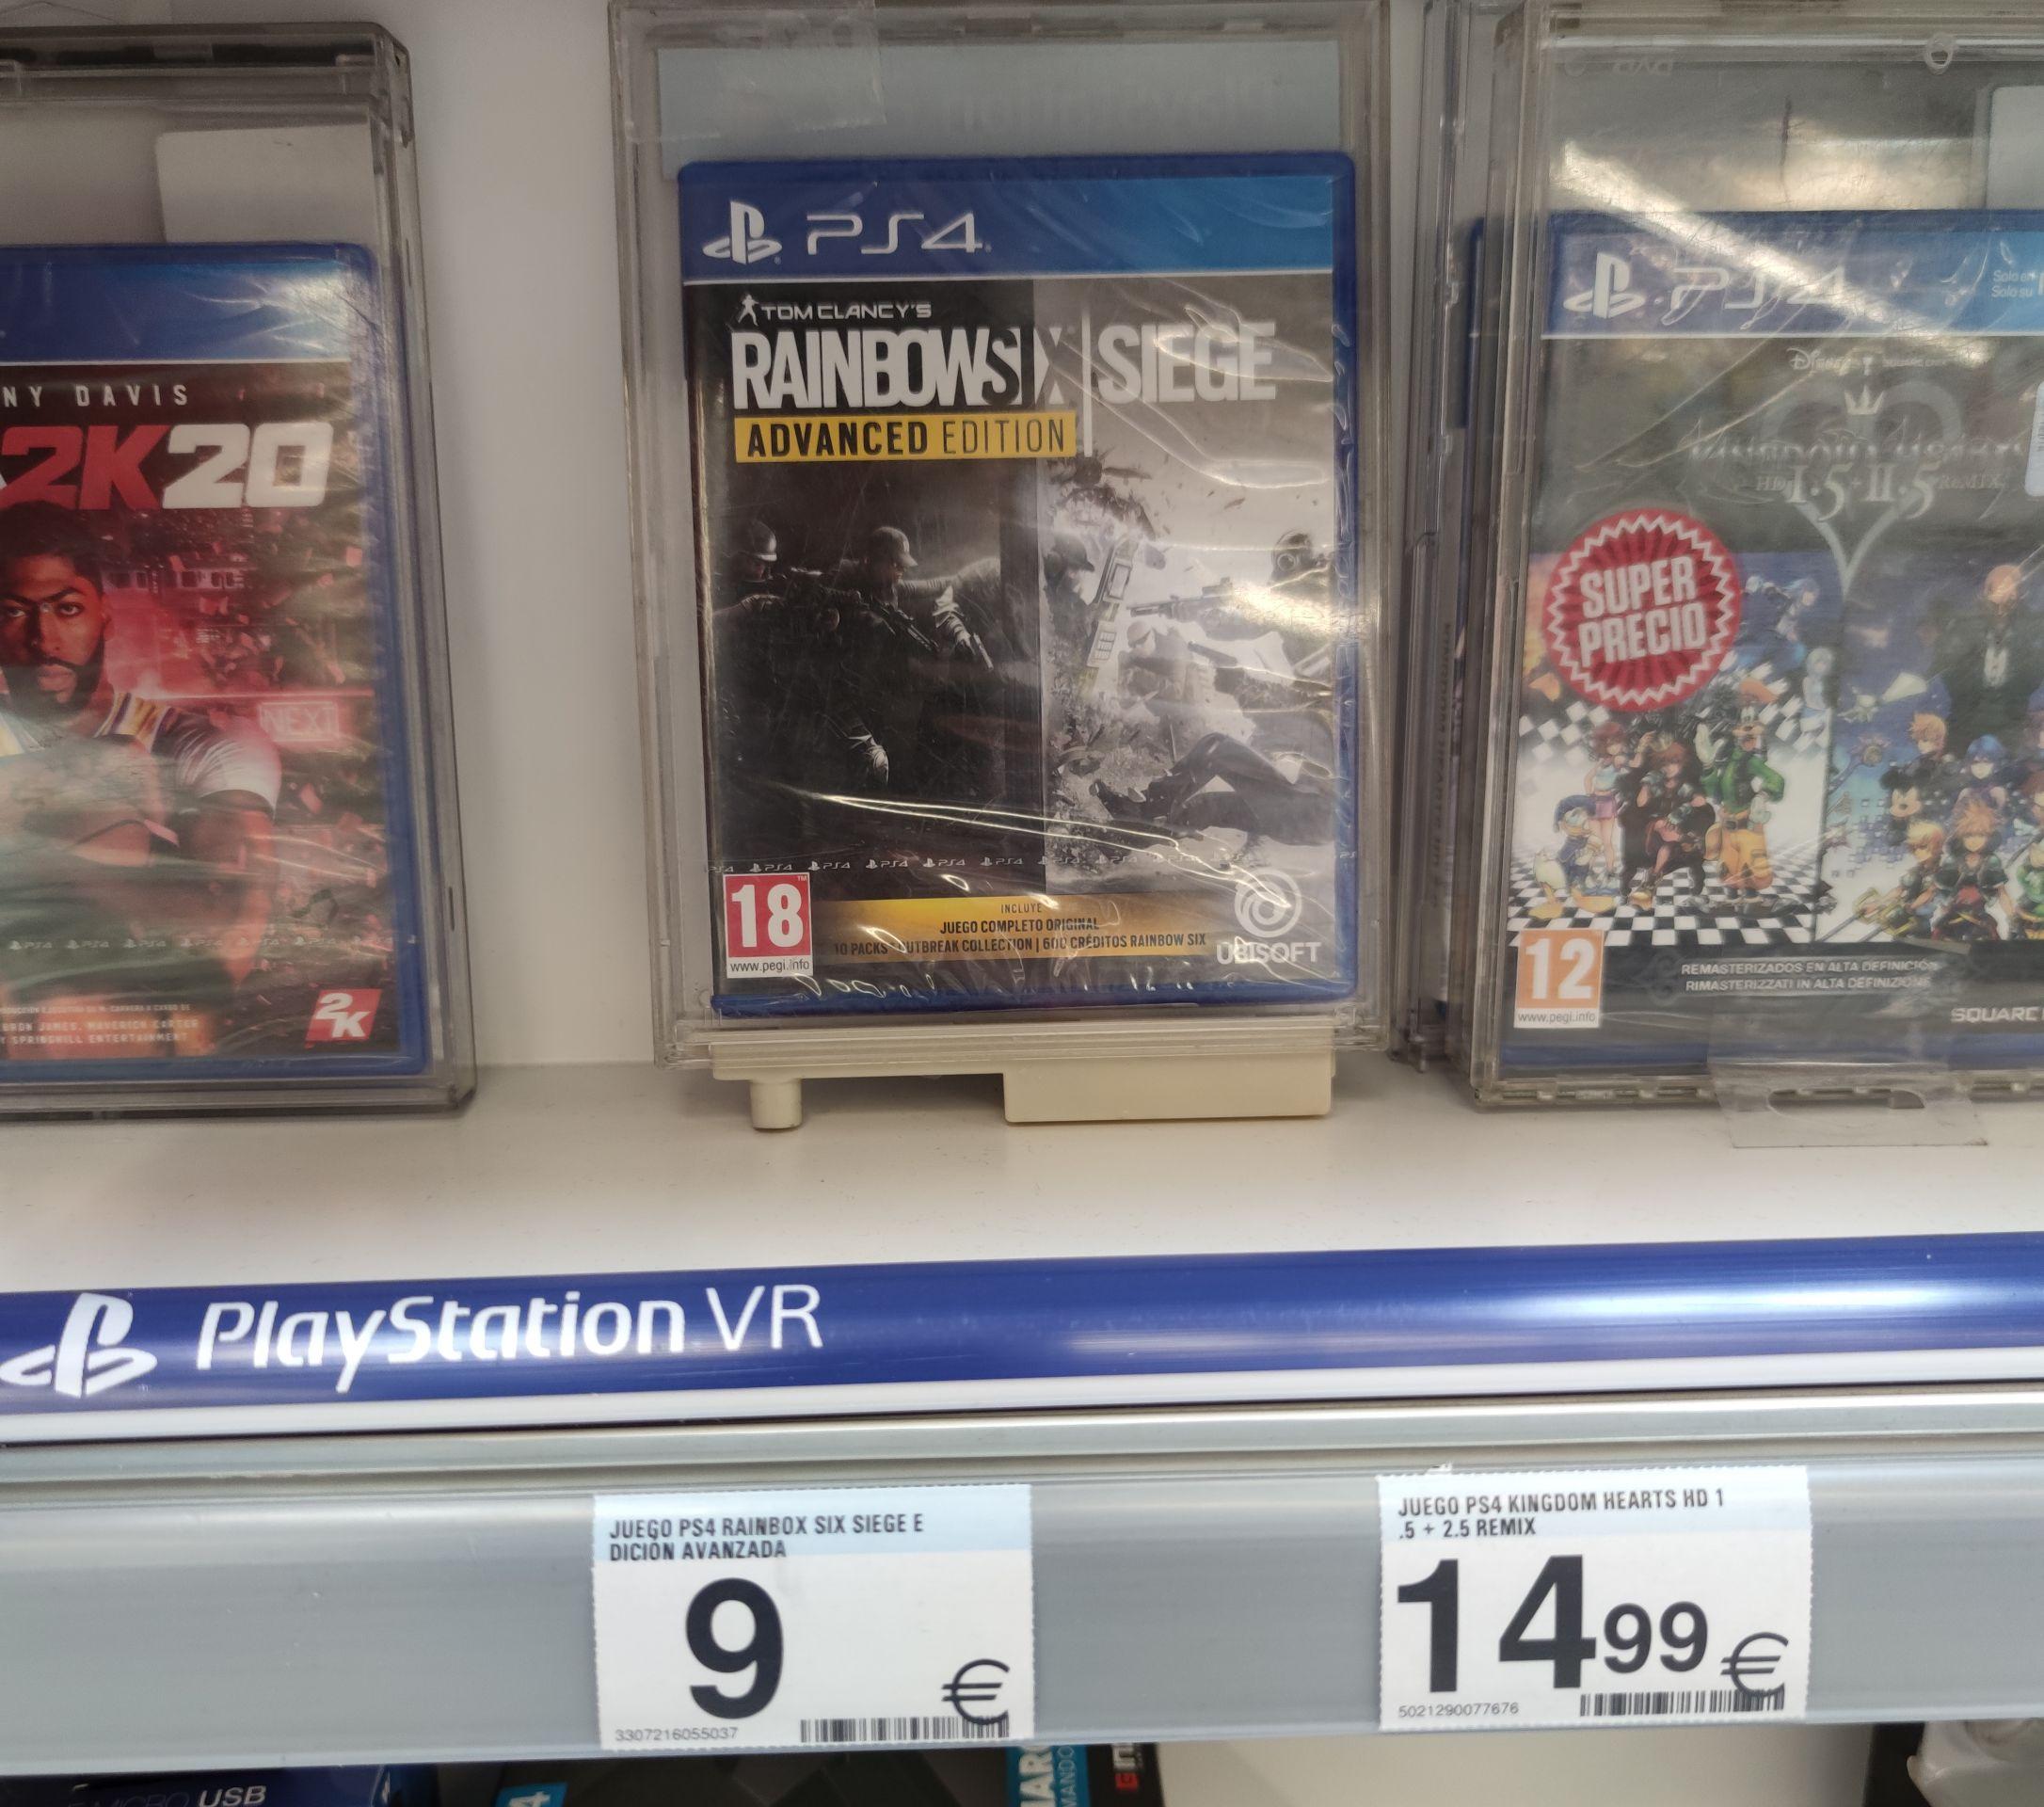 Rainbow Six Siege Advanced Edition para PS4 - Carrefour (9'95€ en GAME)